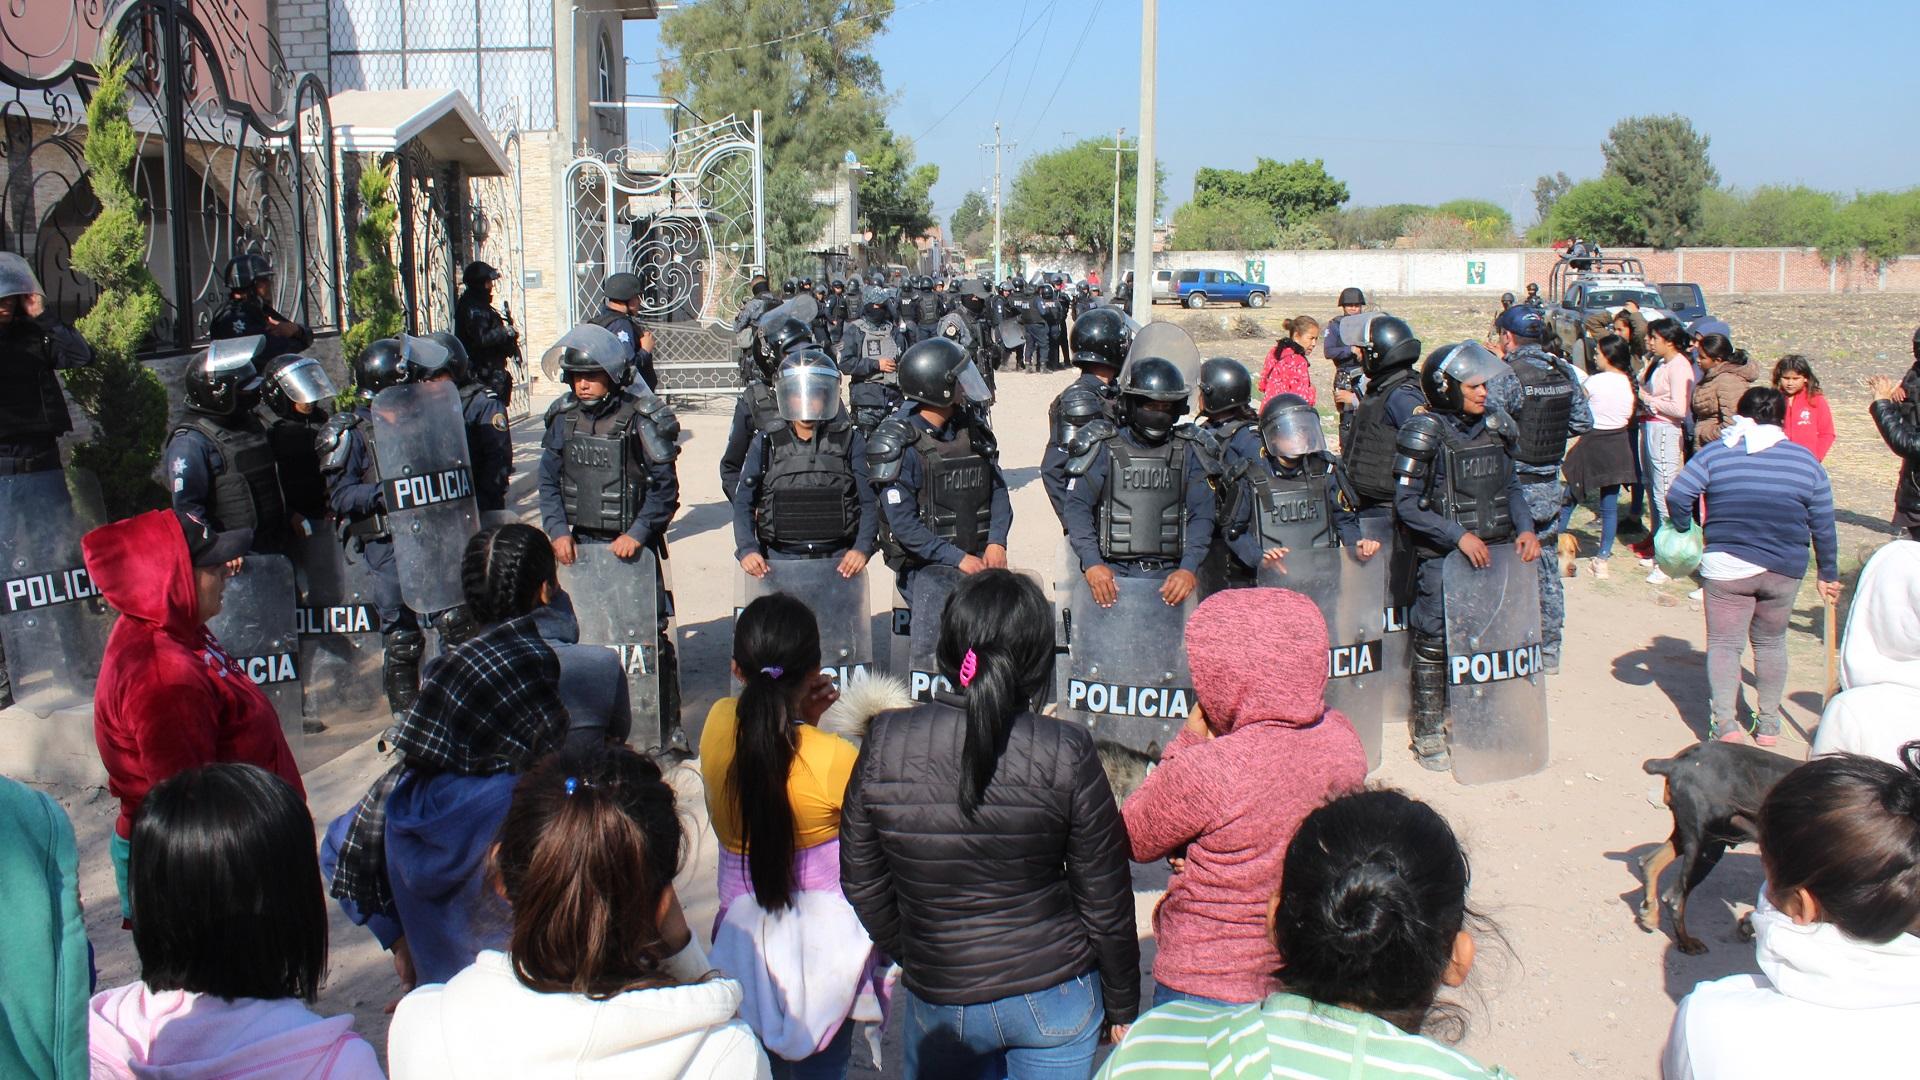 Policías en Villagrán, Guanajuato. Foto de Periódico AM